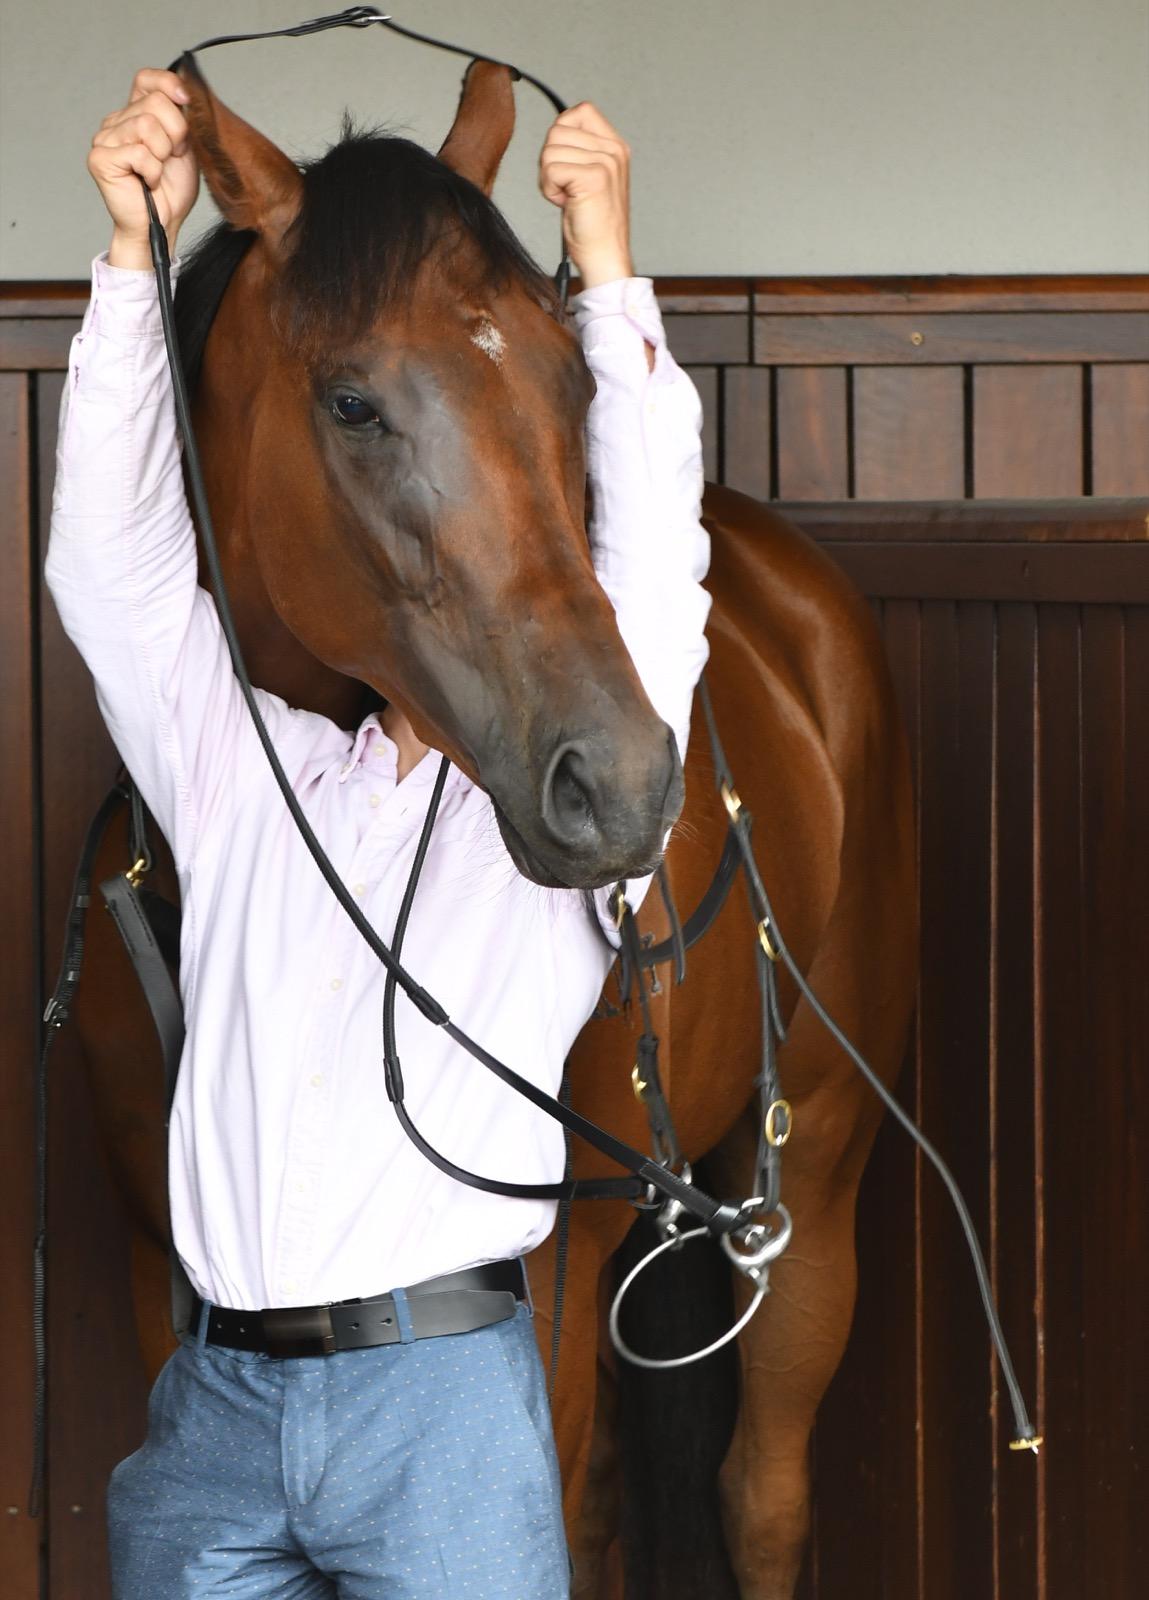 Freddie Lenclud saddles up Oscietra during Melbourne Racing at Flemington Racecourse. Vince Caligiuri/Getty Images